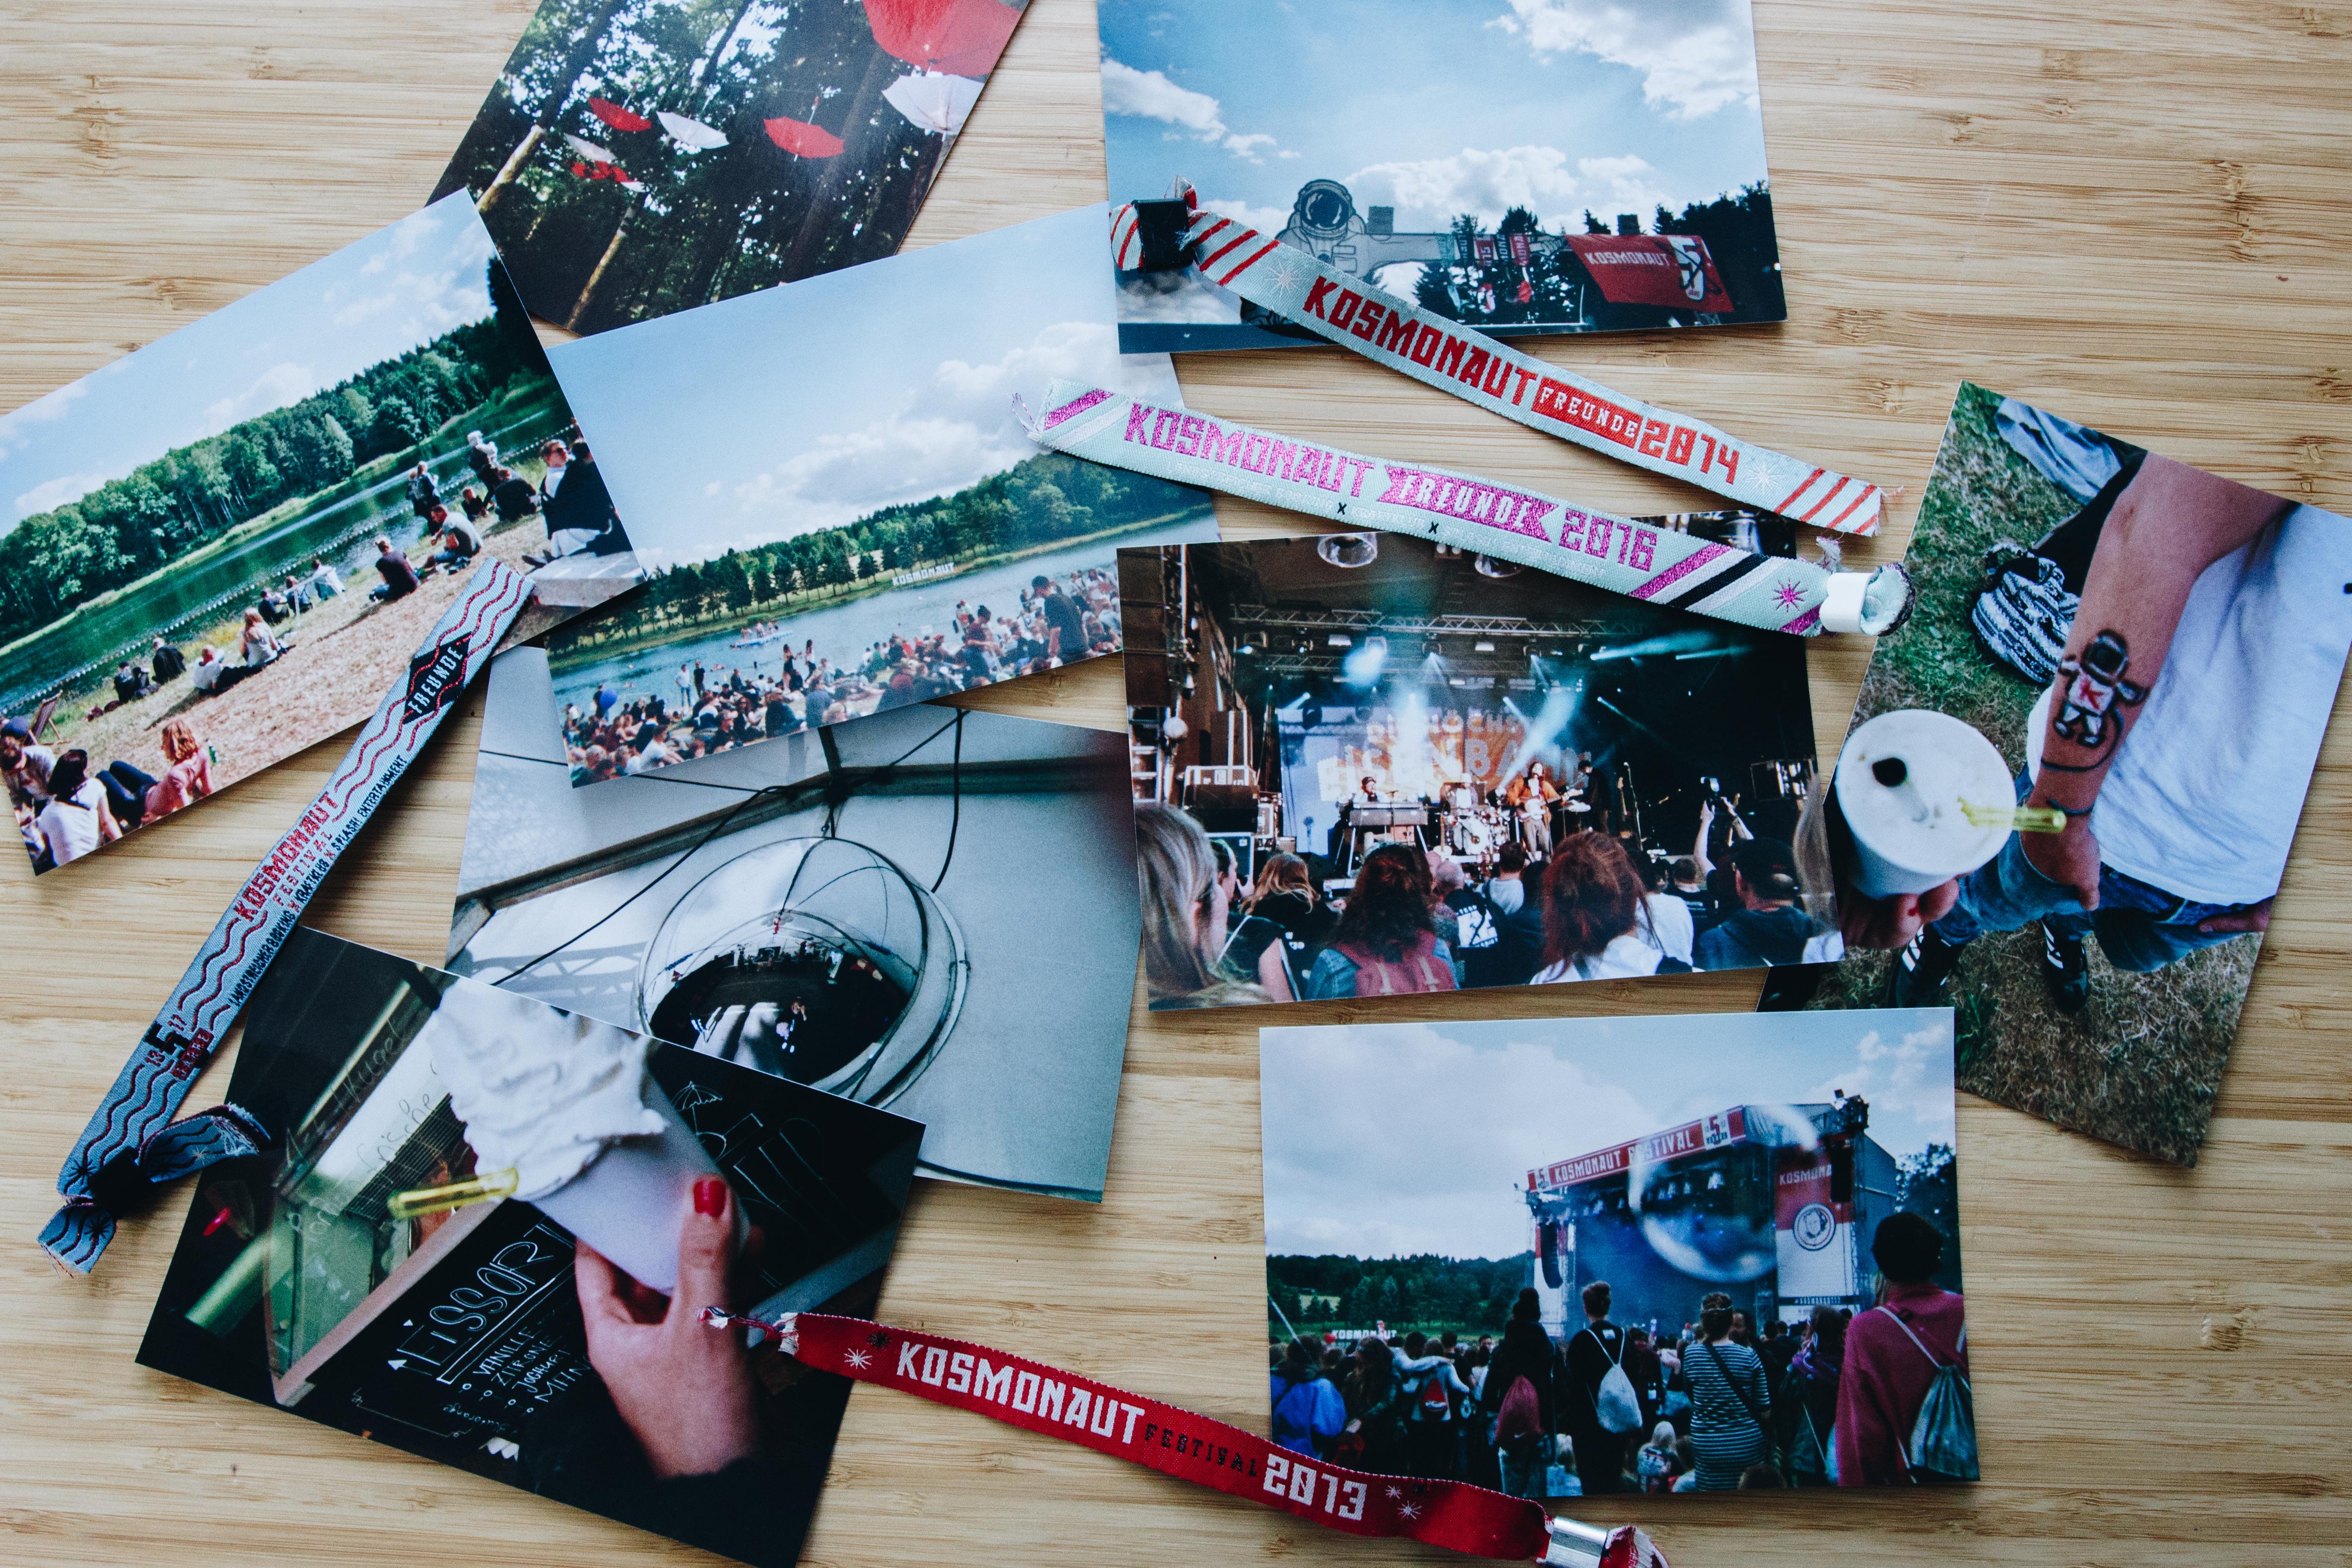 annabelle sagt-kosmonaut festival